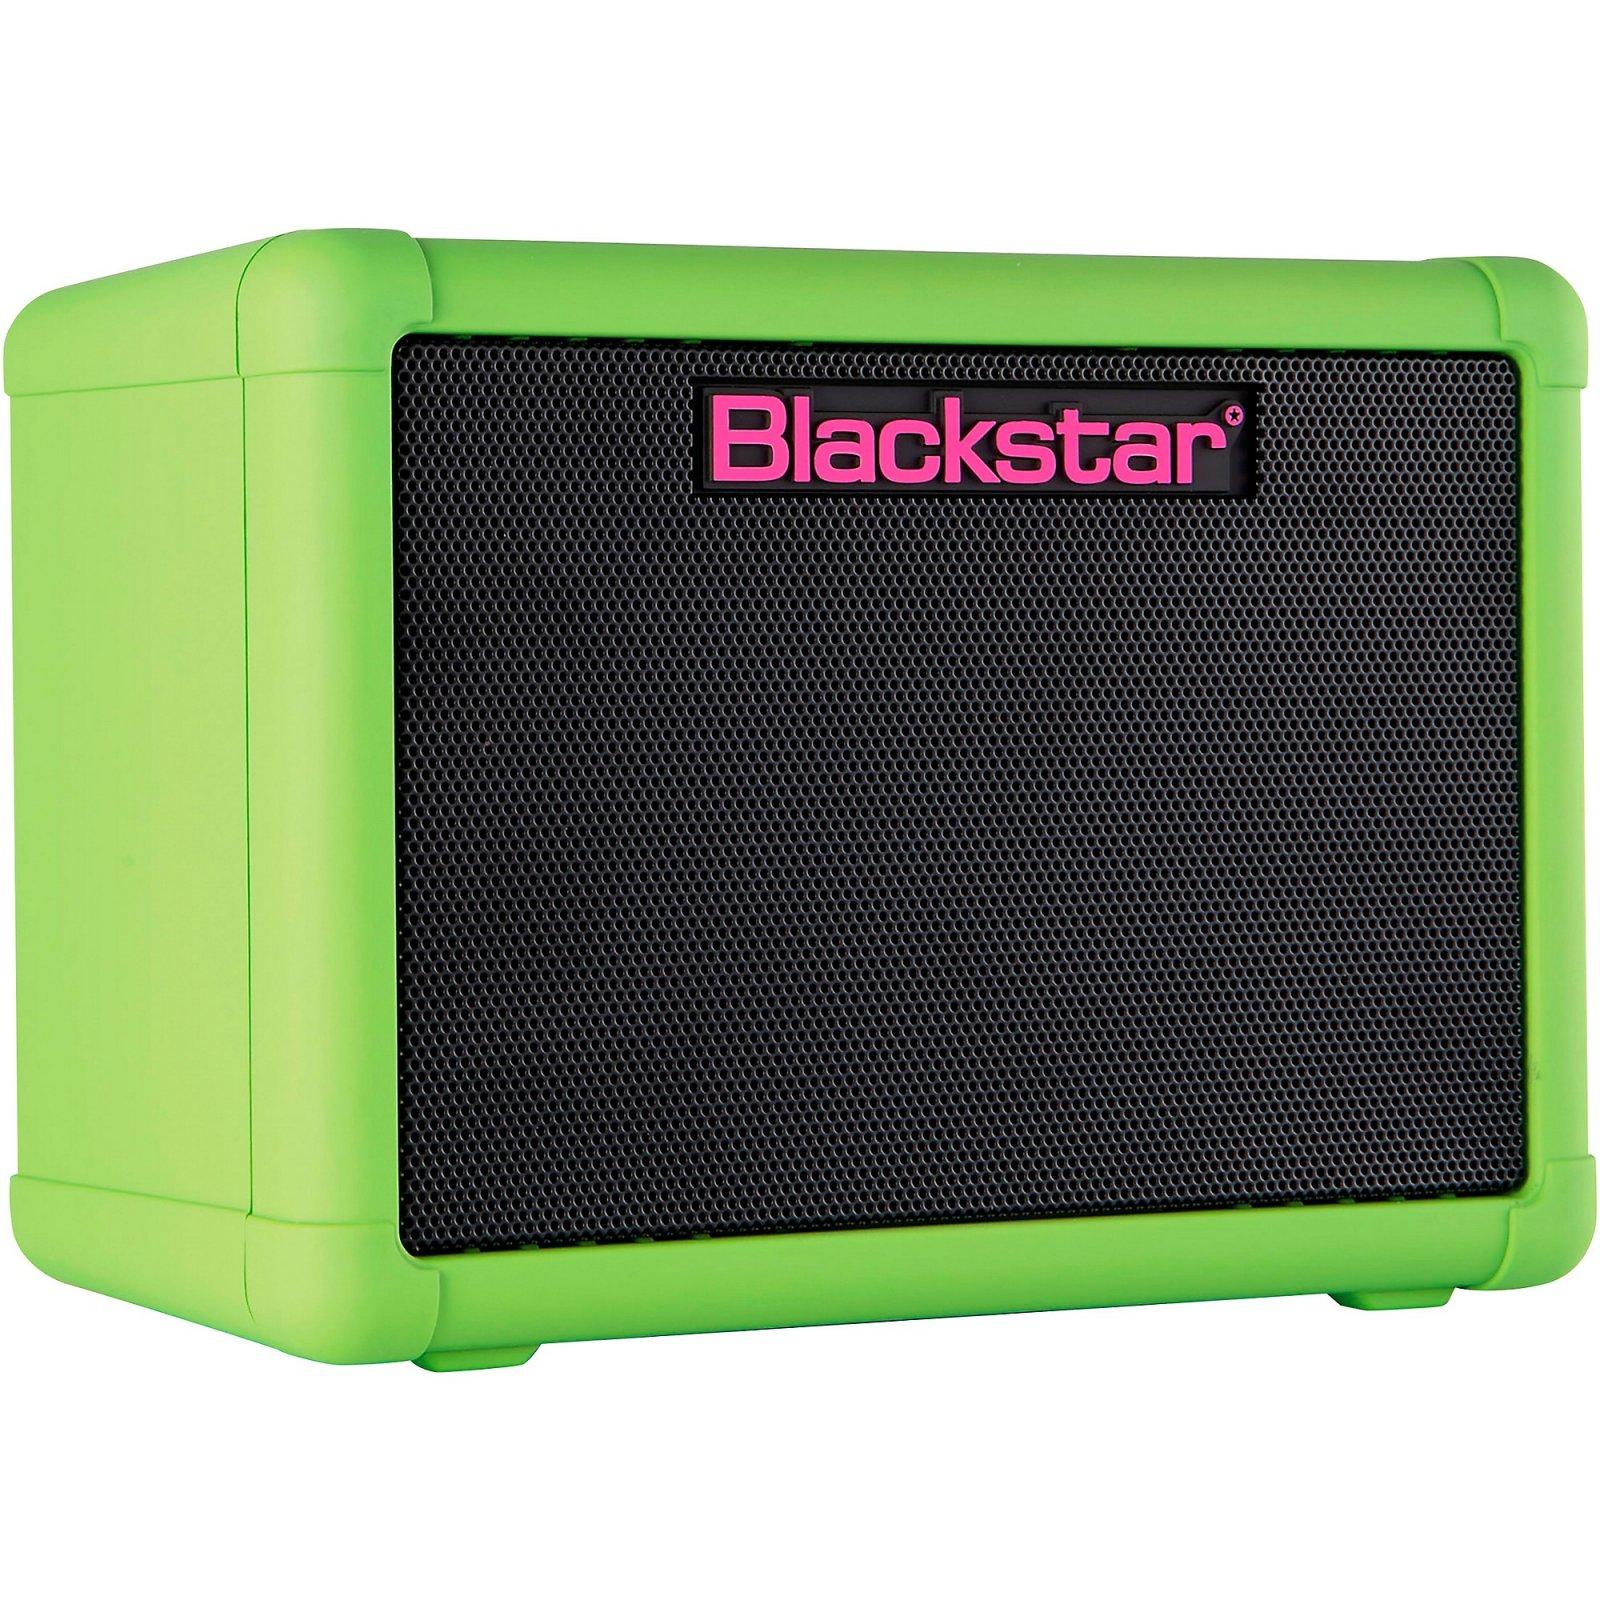 Blackstar FLY3 Mini Guitar Amplifier Neon Green